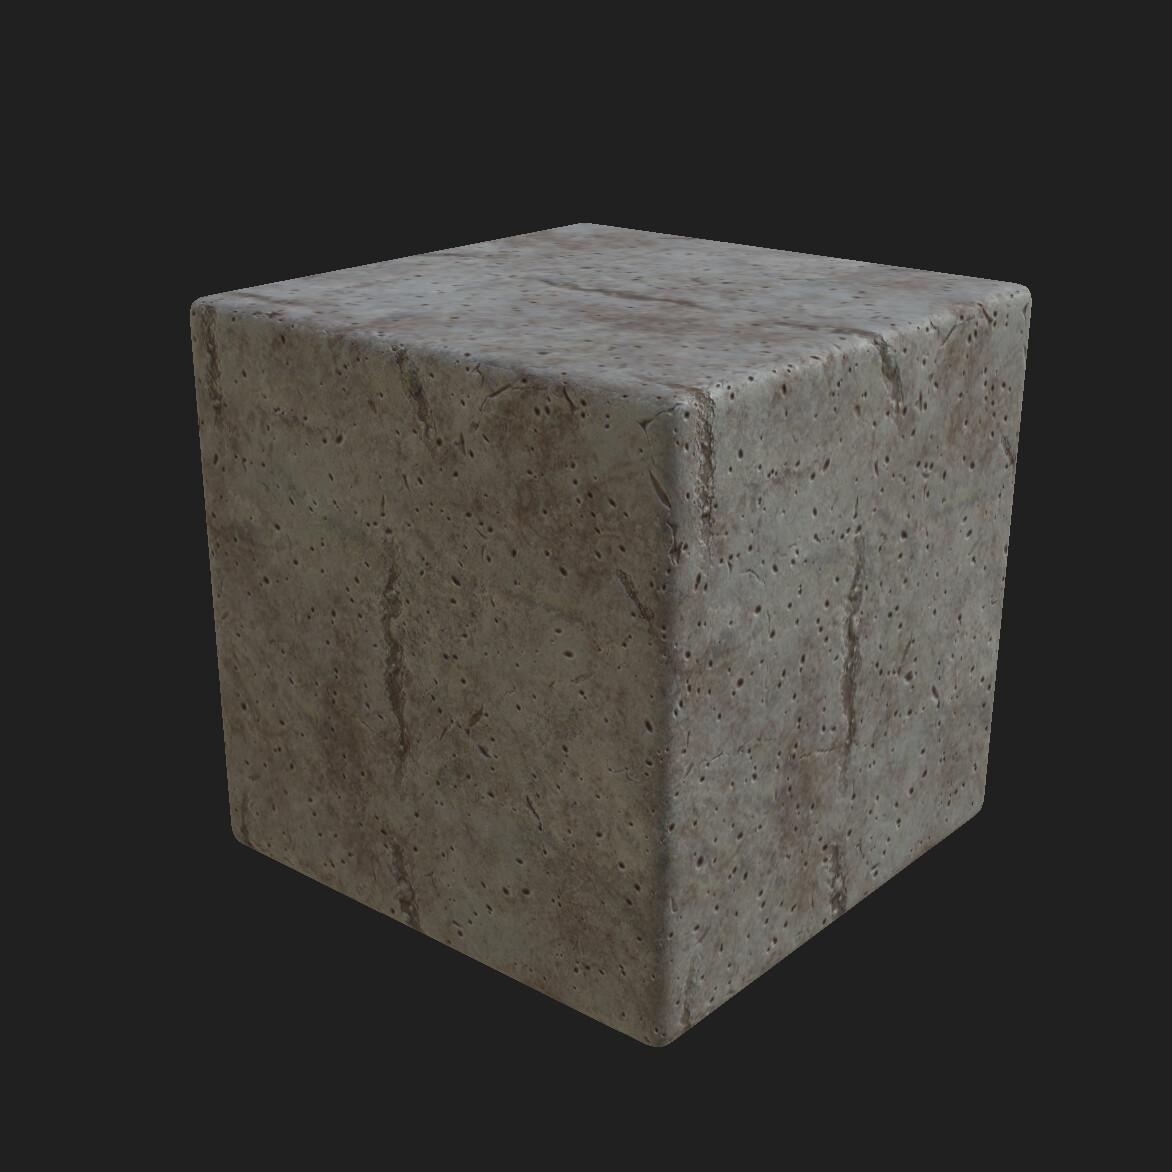 Concrete Material Substance Designer